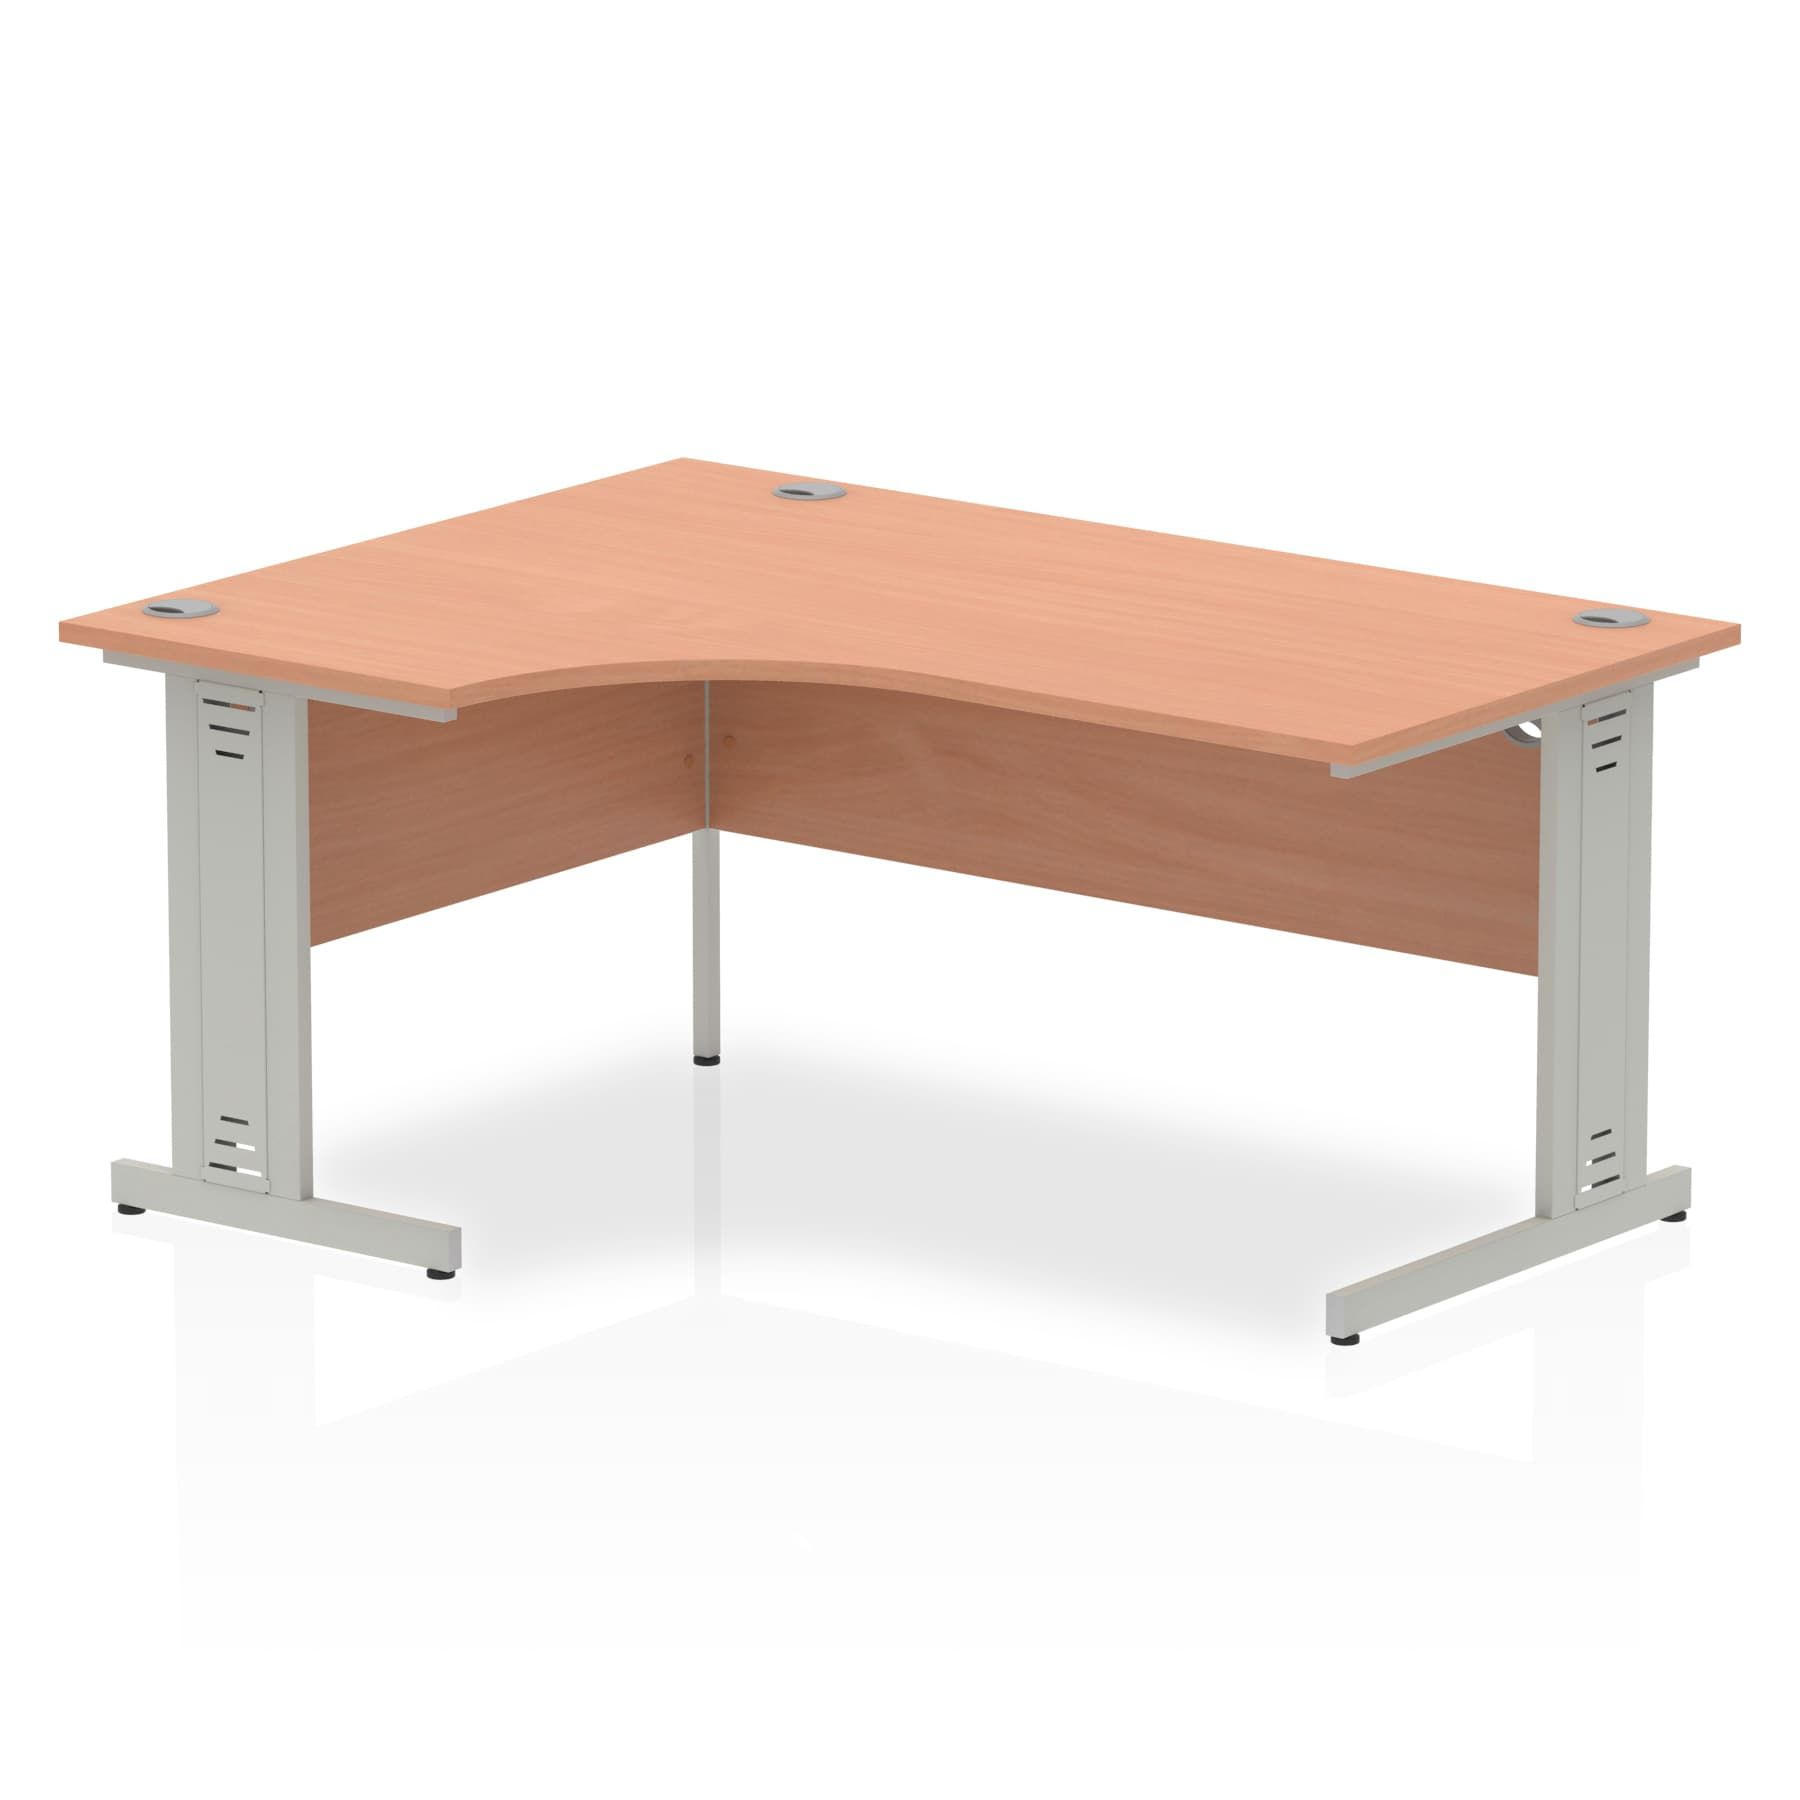 Impulse 1600 Left Hand Crescent Desk